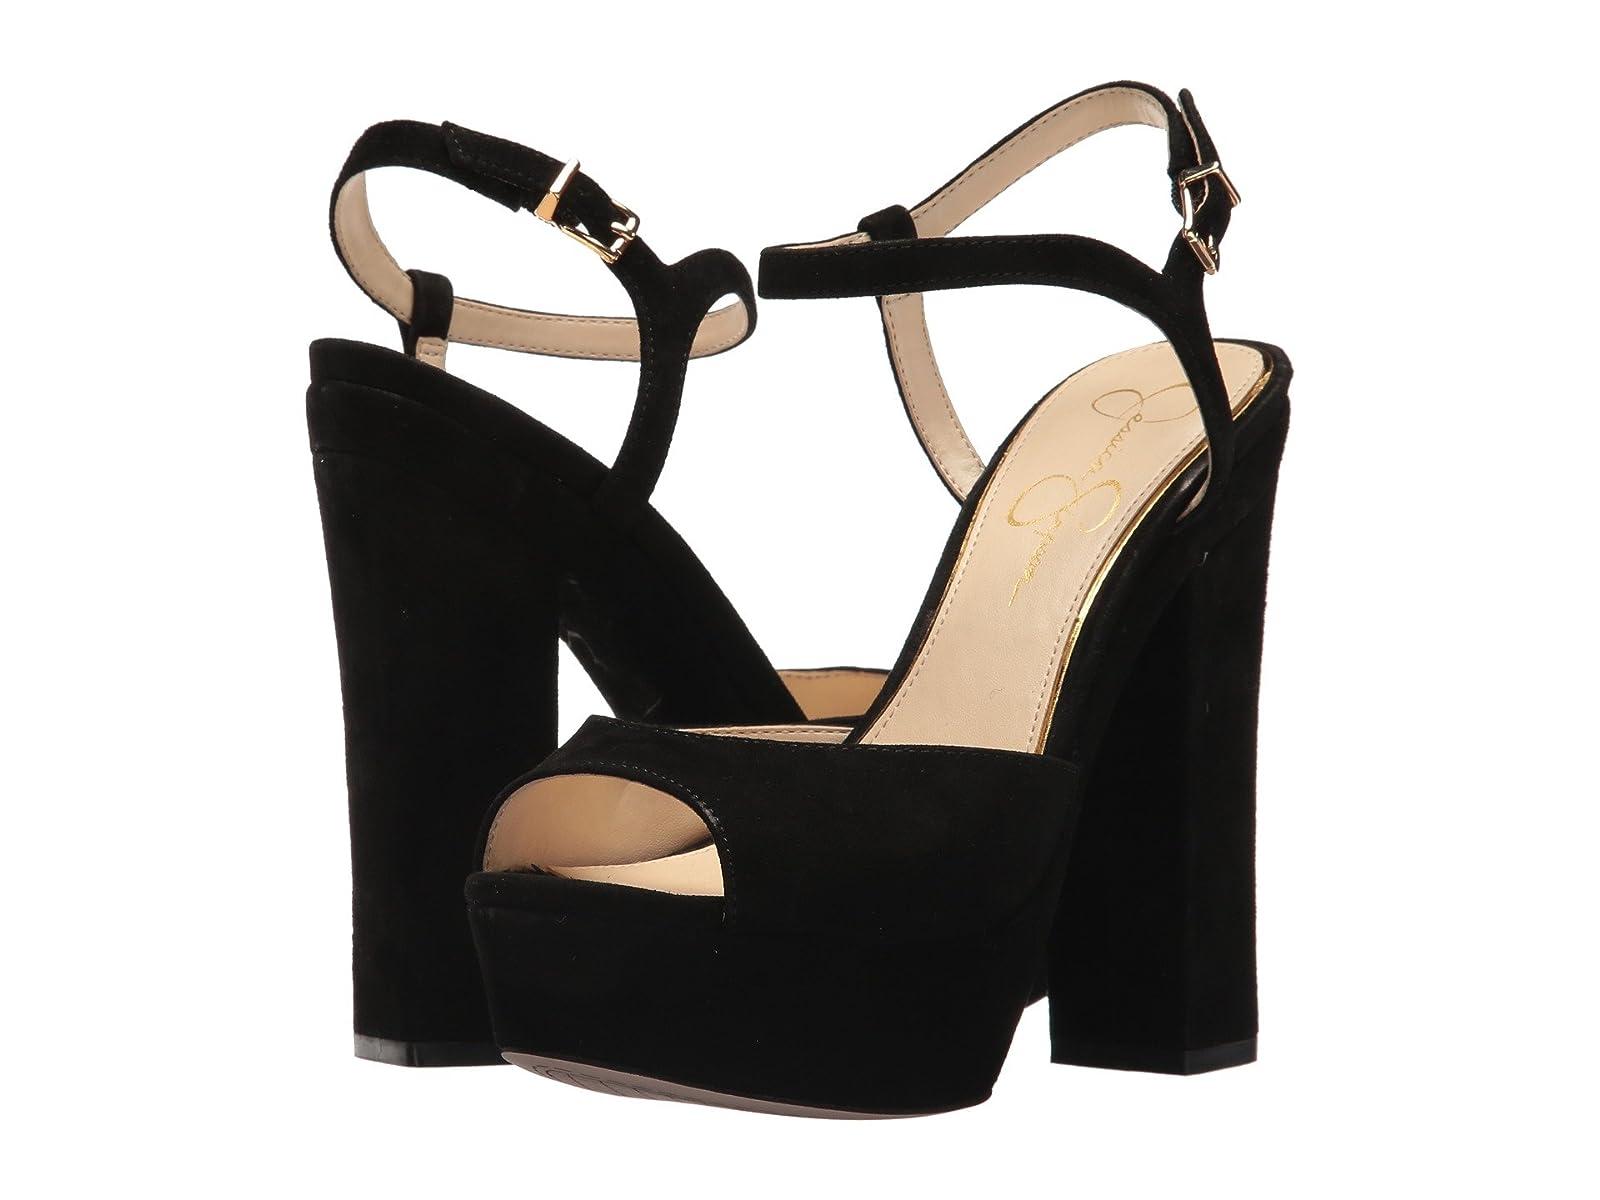 Jessica Simpson LorinnaCheap and distinctive eye-catching shoes